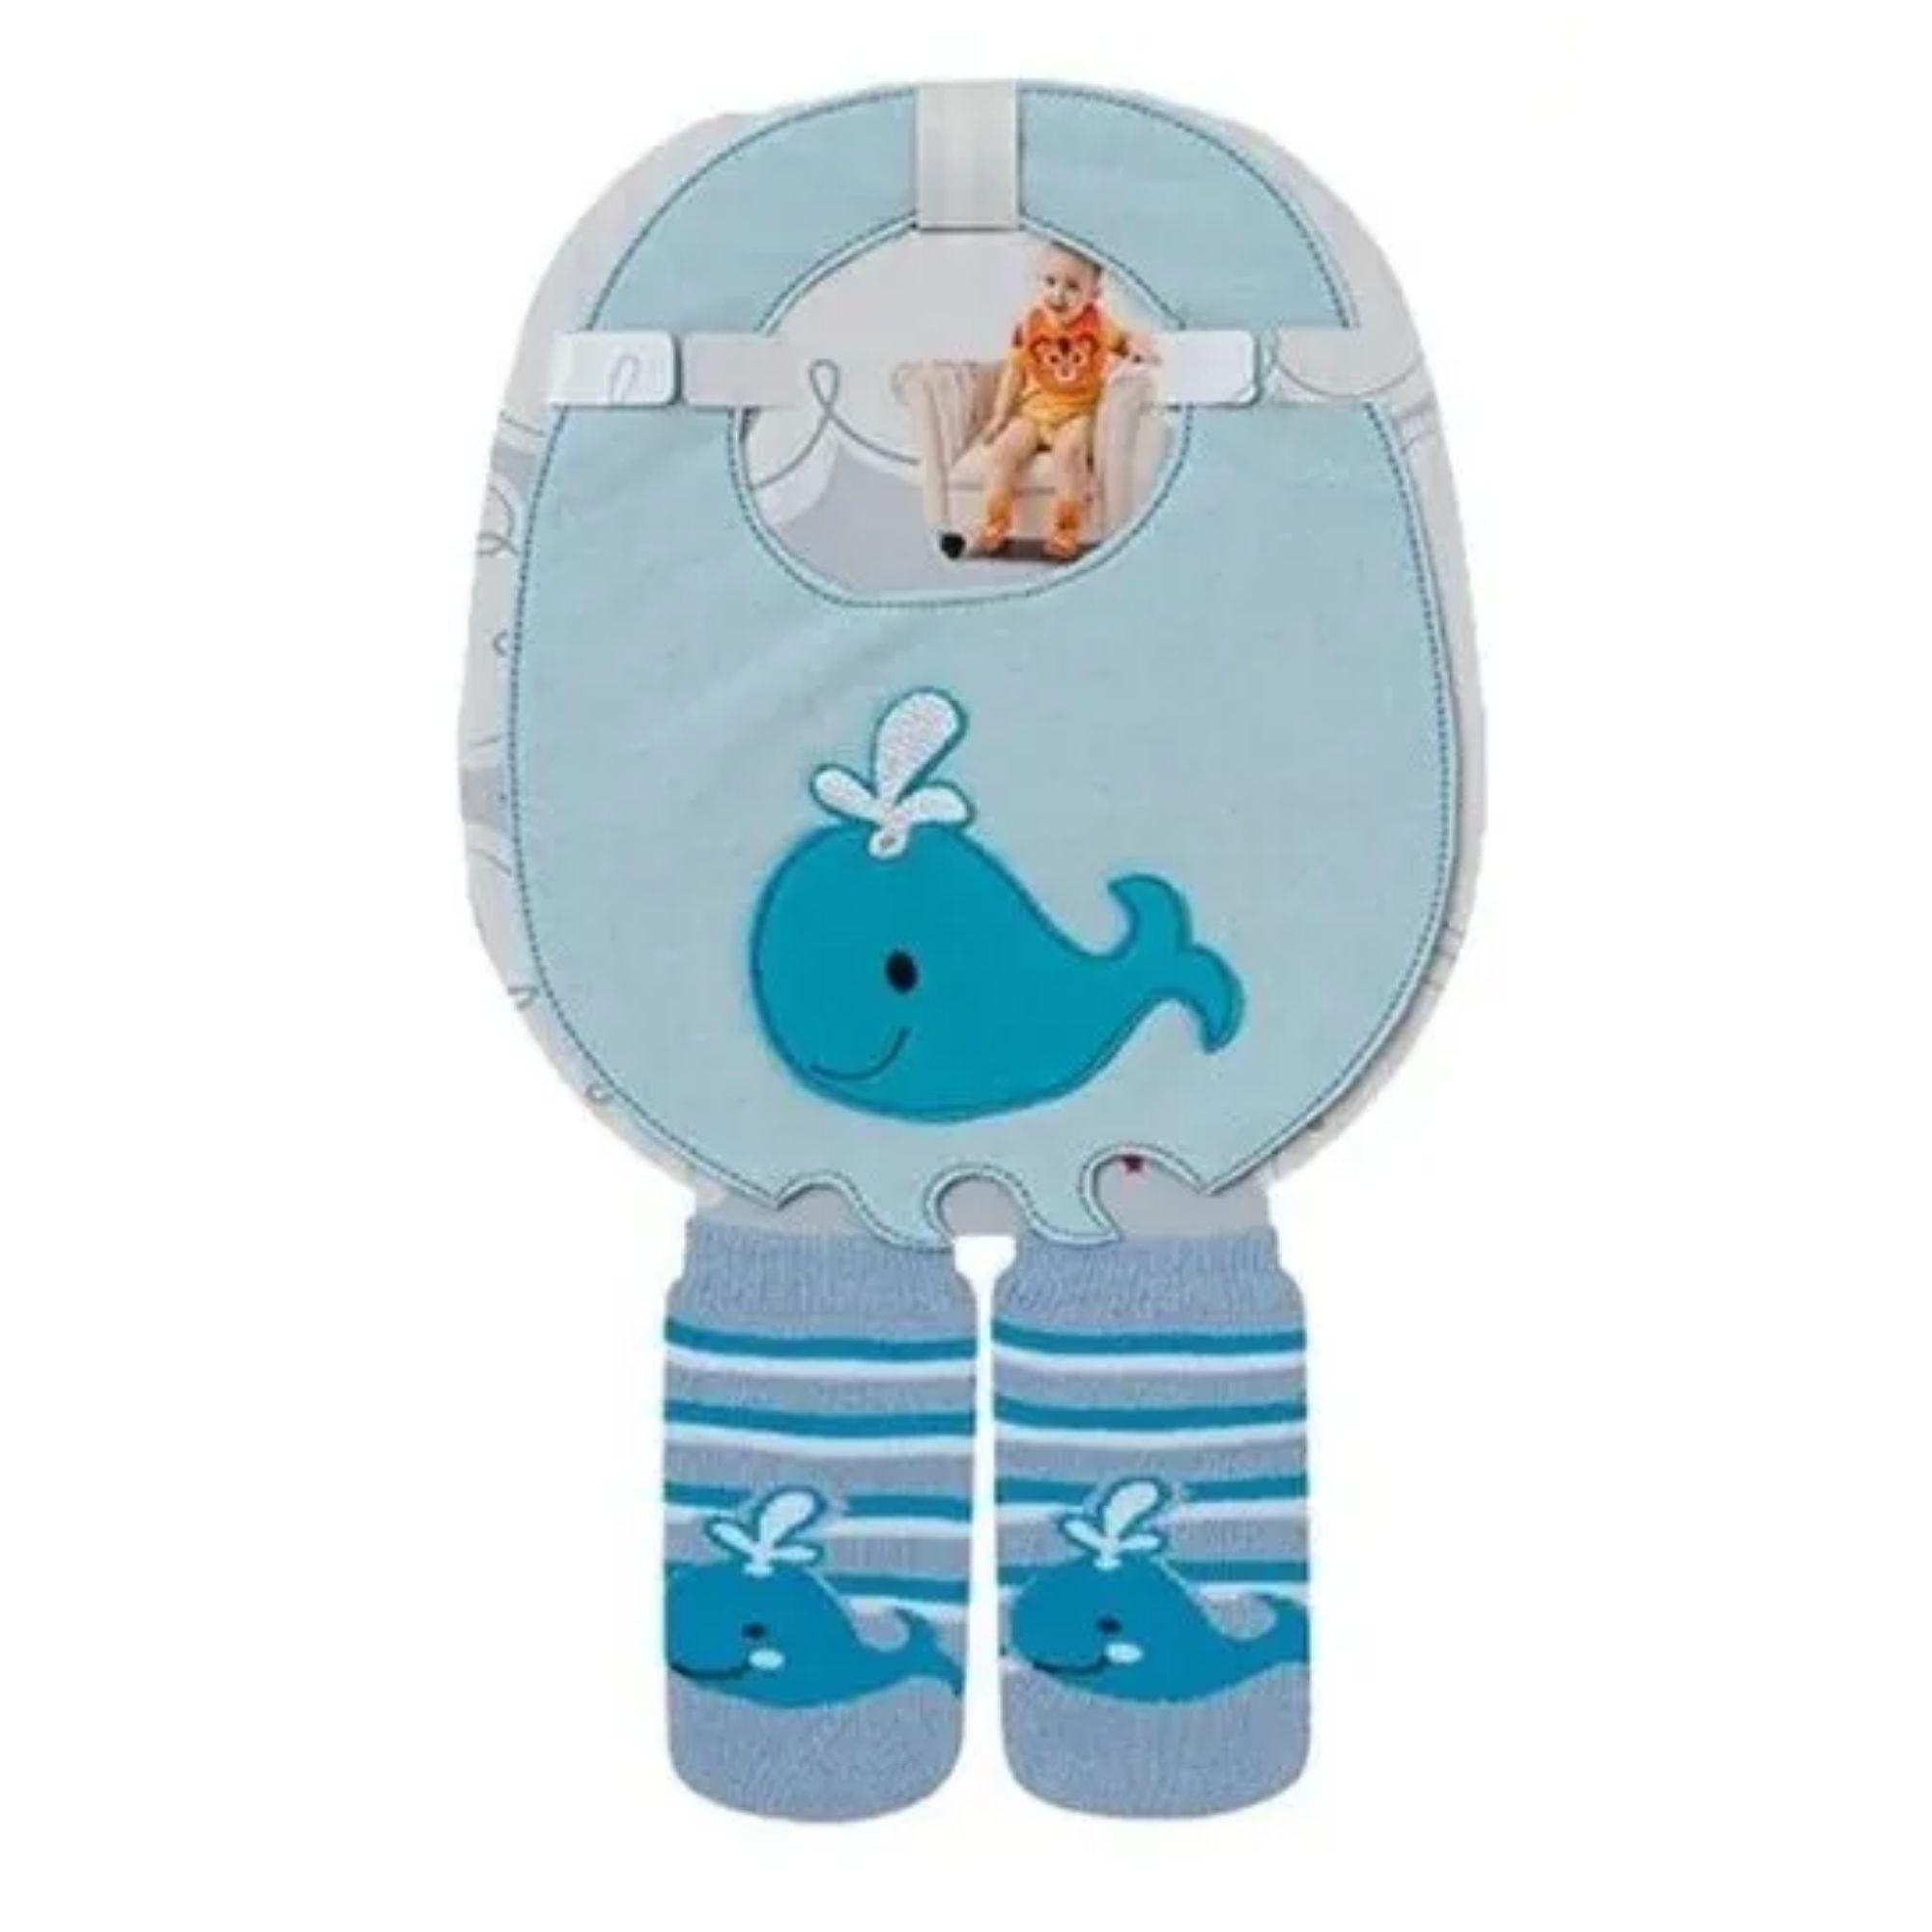 Kit Babador + meia para bebê mesma estampa 4 a 8 meses  - Game Land Brinquedos